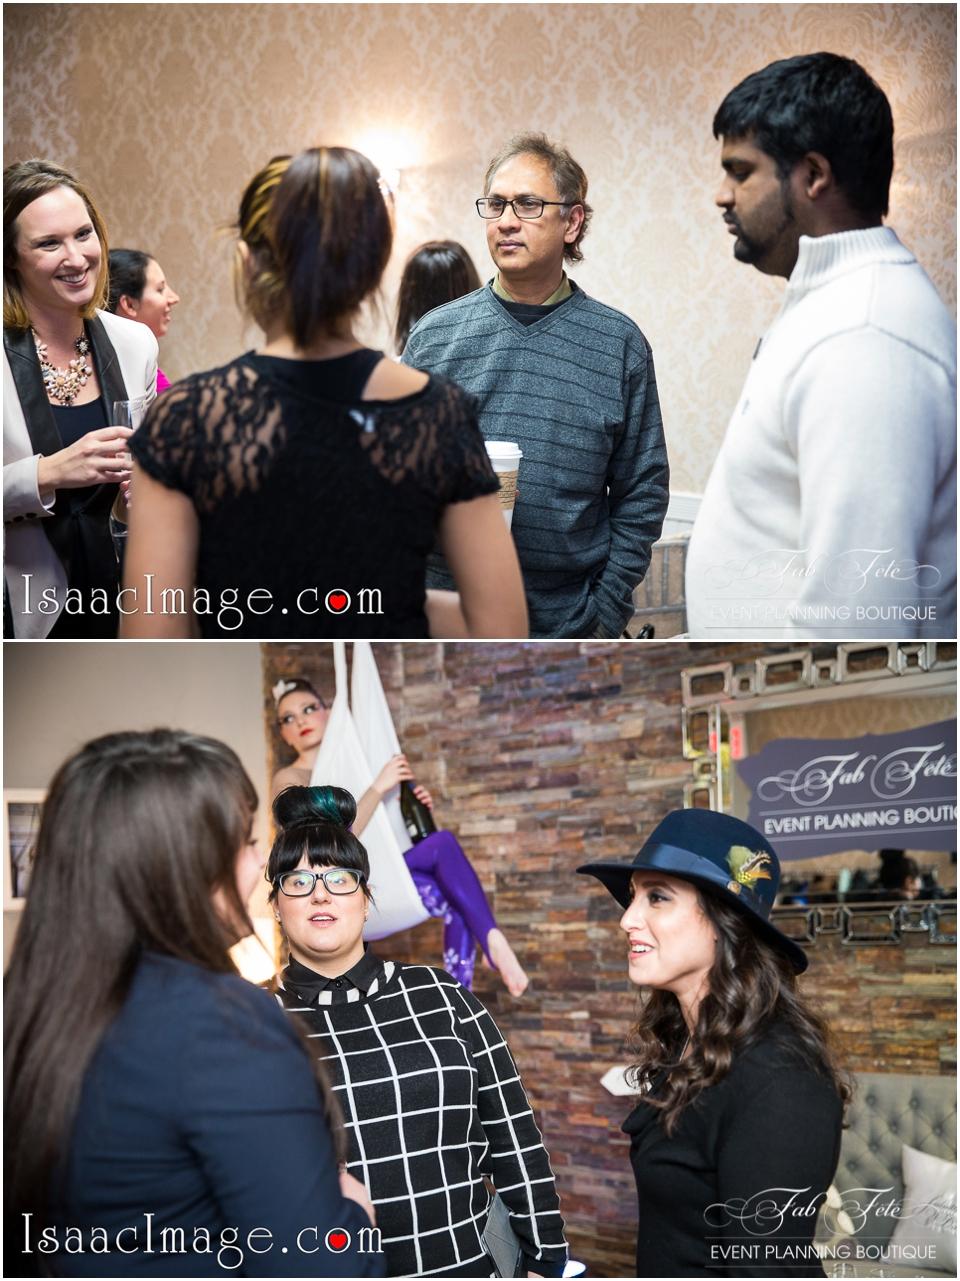 Fab Fete Toronto Wedding Event Planning Boutique open house_6494.jpg